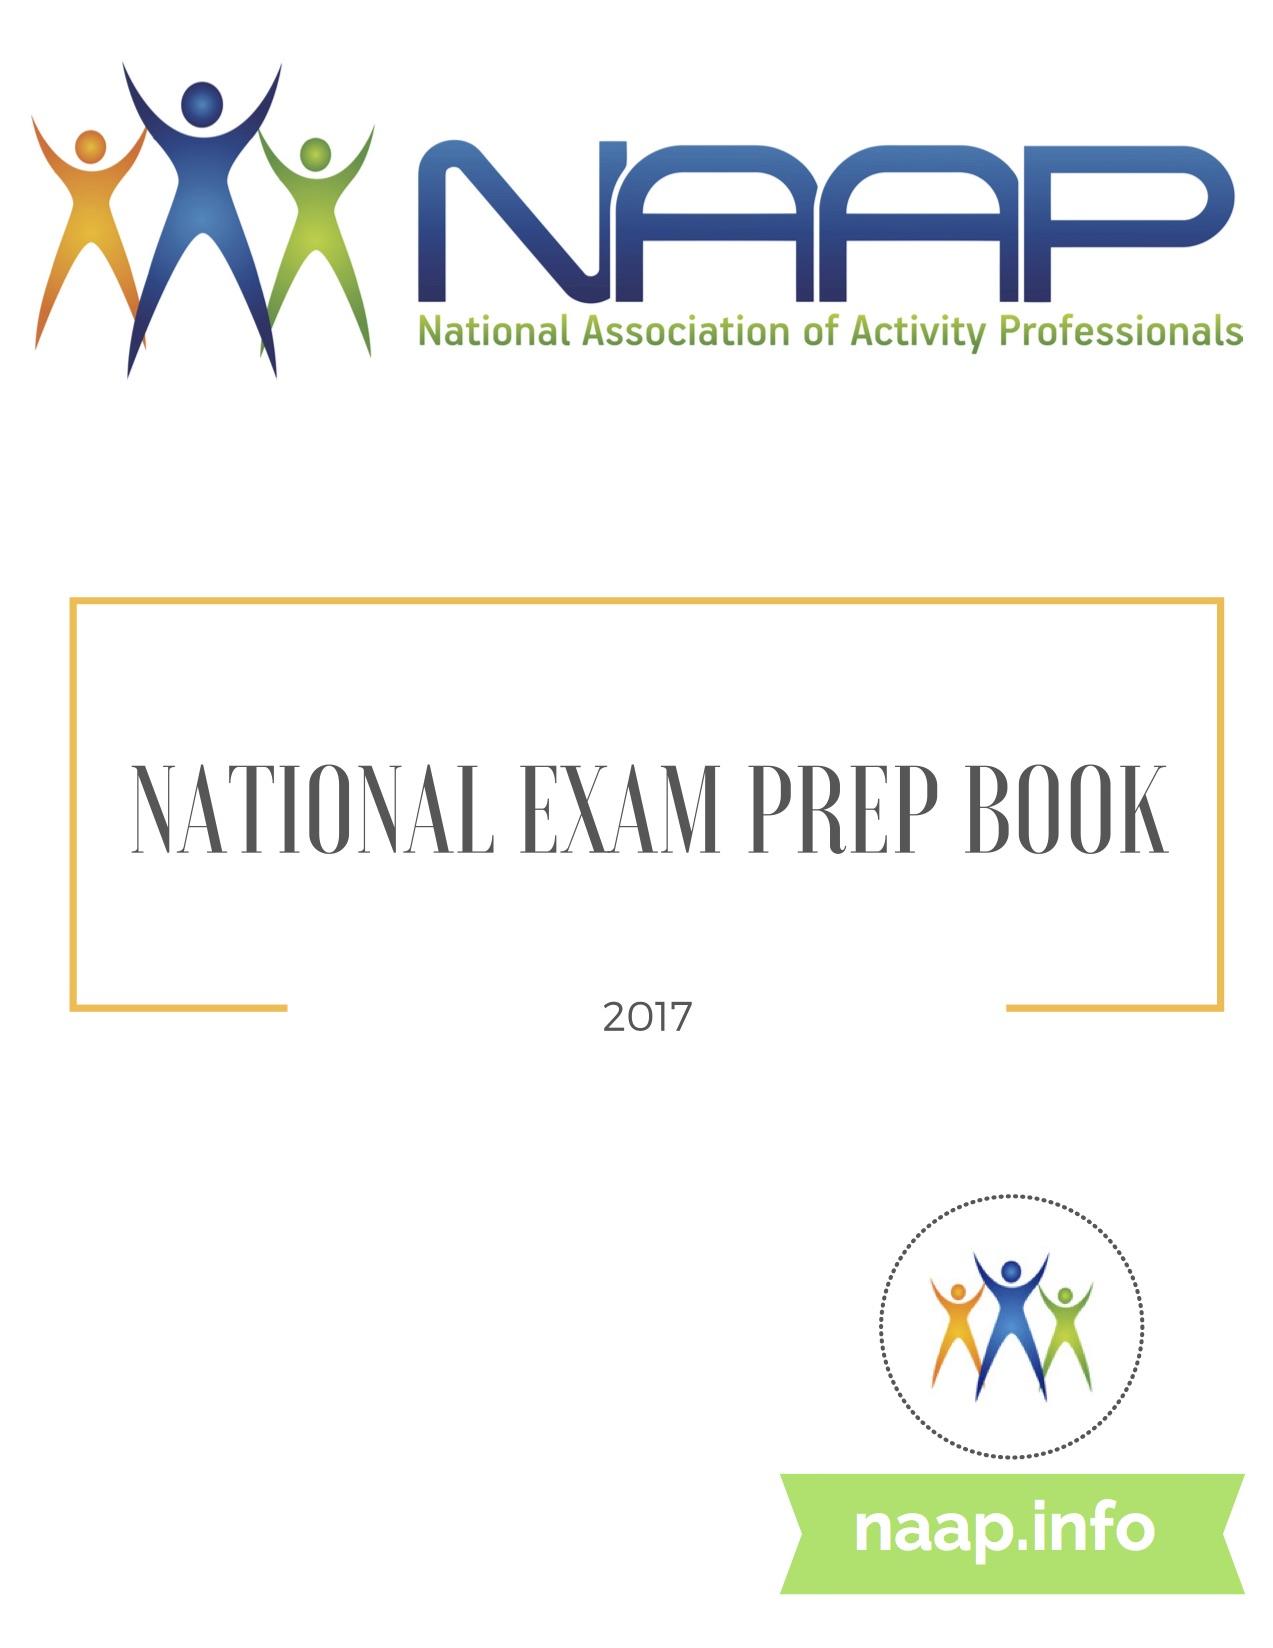 Naap Exam Review Study Guide Book Naap National Association